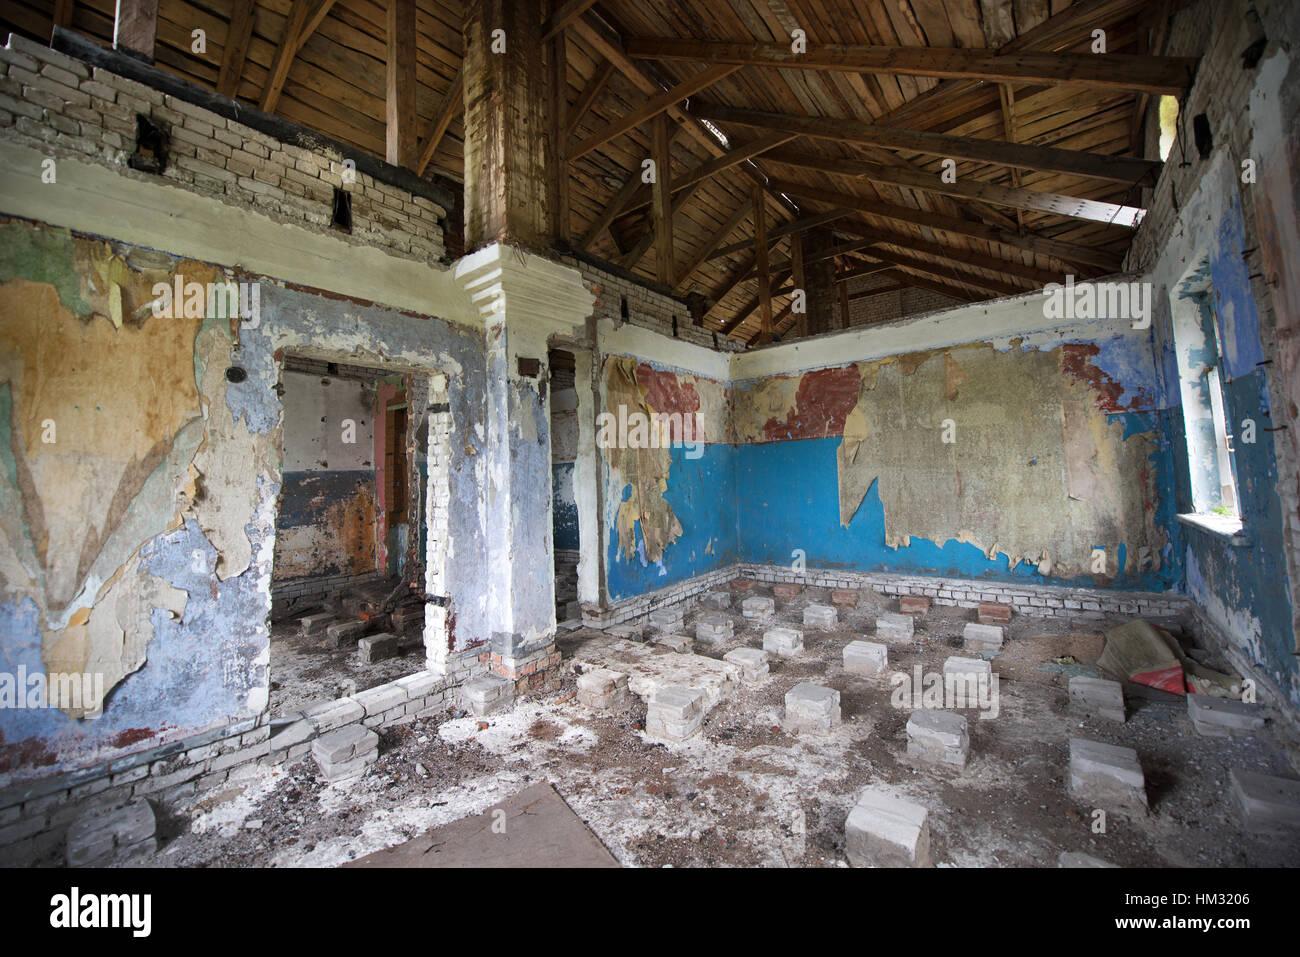 Abandoned building in the area of Paldiski former naval base, Pakri Peninsula, Harju County, Estonia - Stock Image